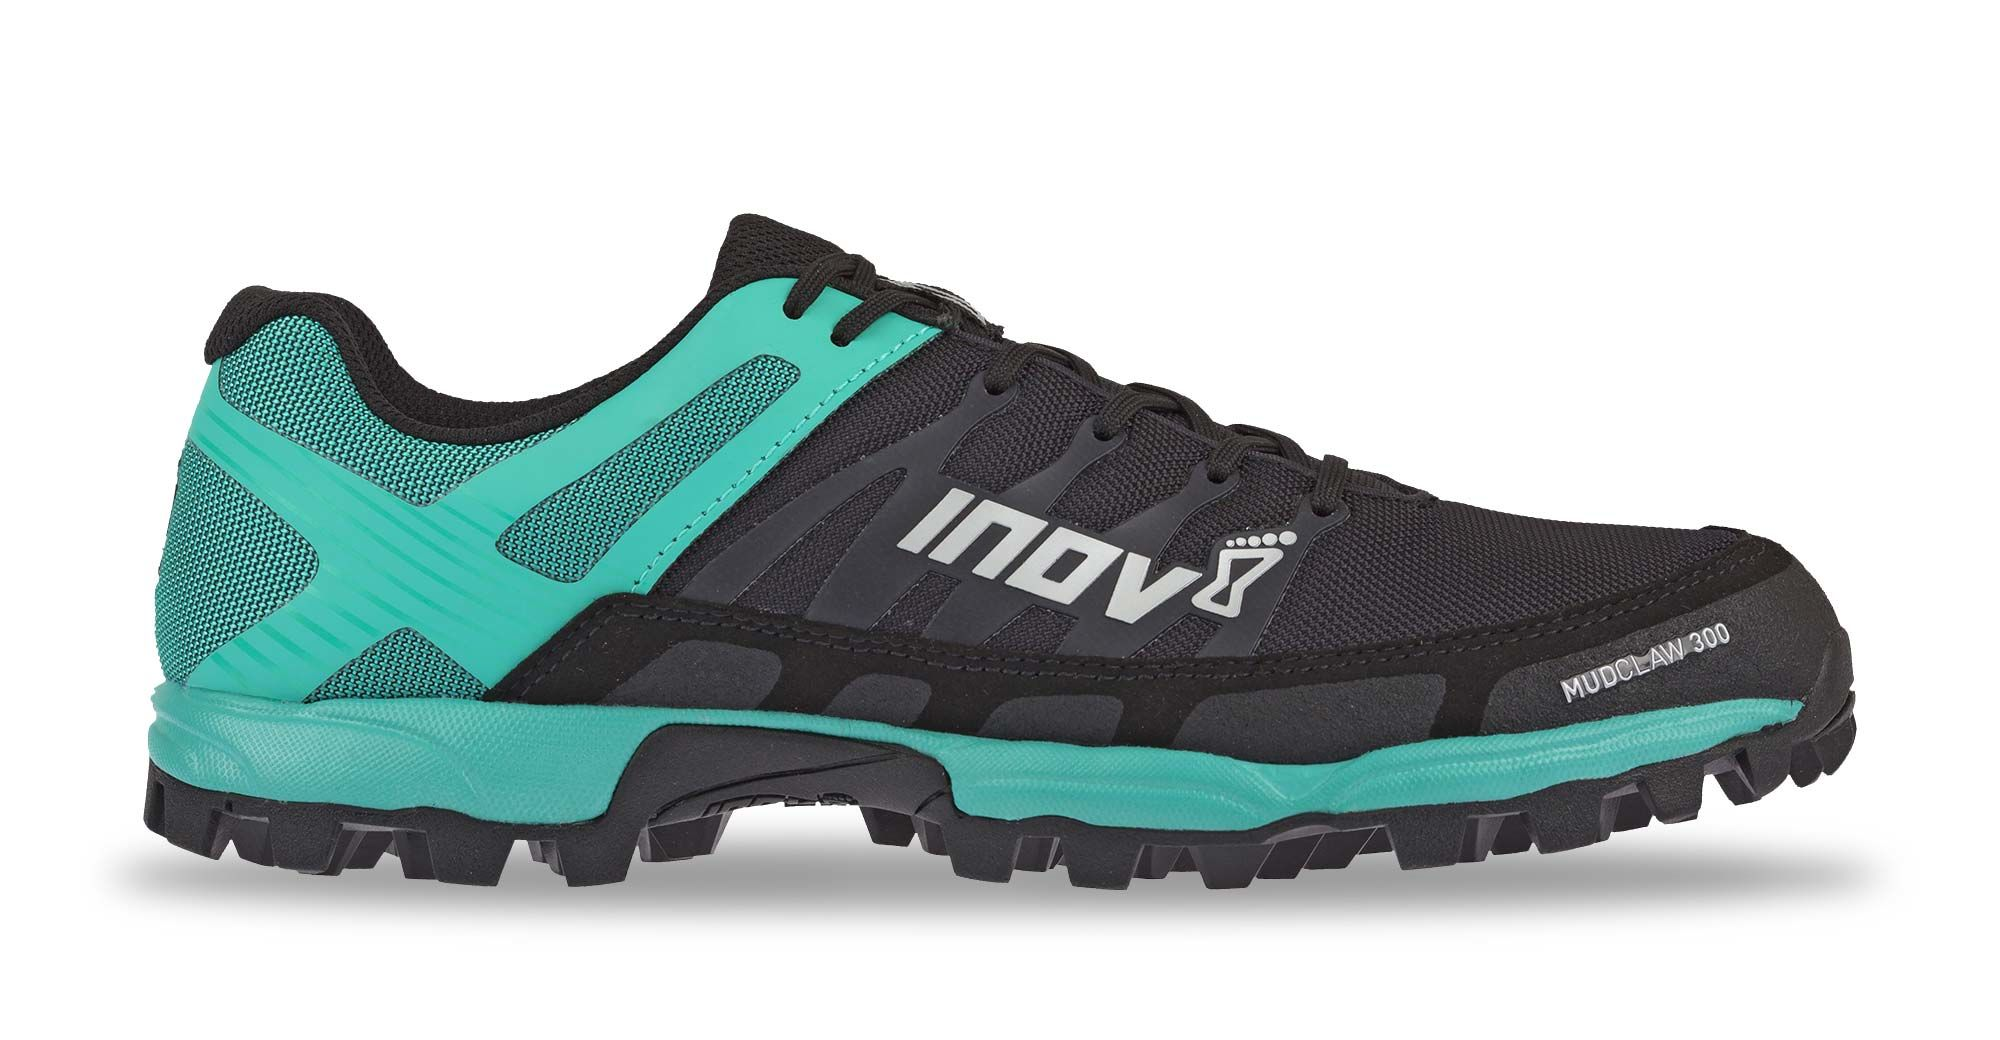 c0aec7d397a Inov-8 Mudclaw 300 Womens Fell Running Training Trainers Shoes   eBay